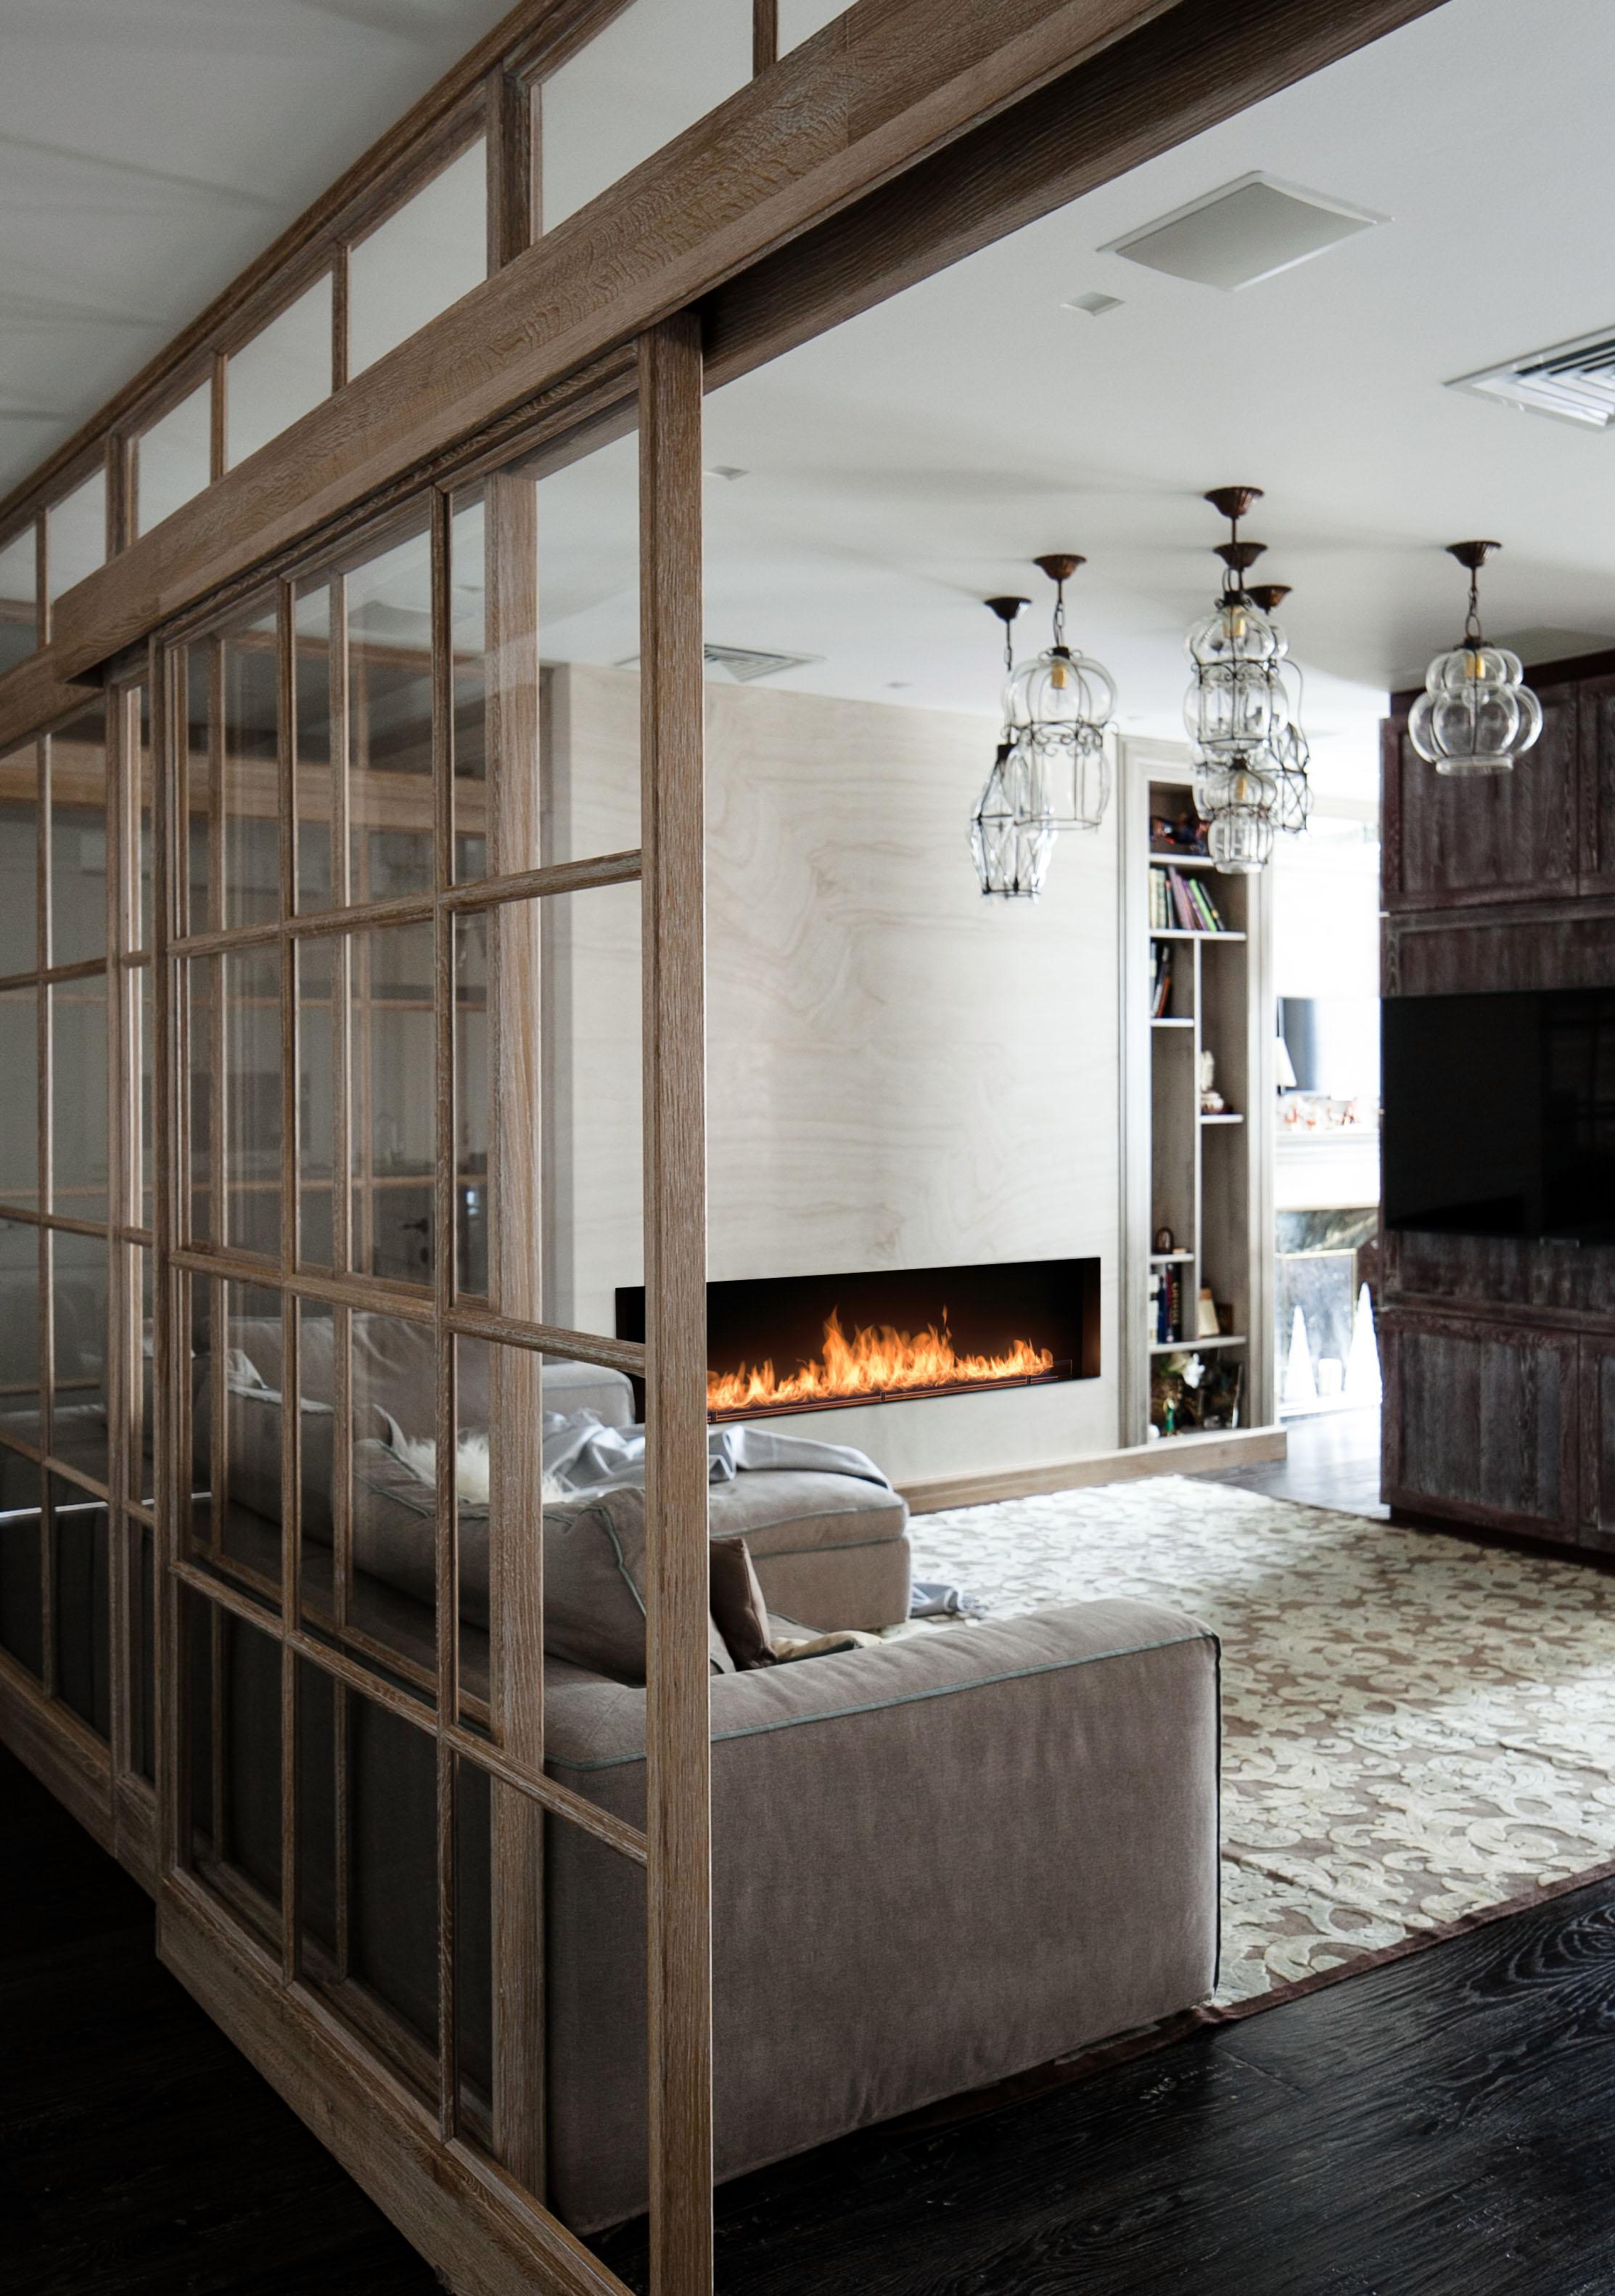 FLA3-in-Private-apartement-Distributor-Bioflame-Russia_.jpg